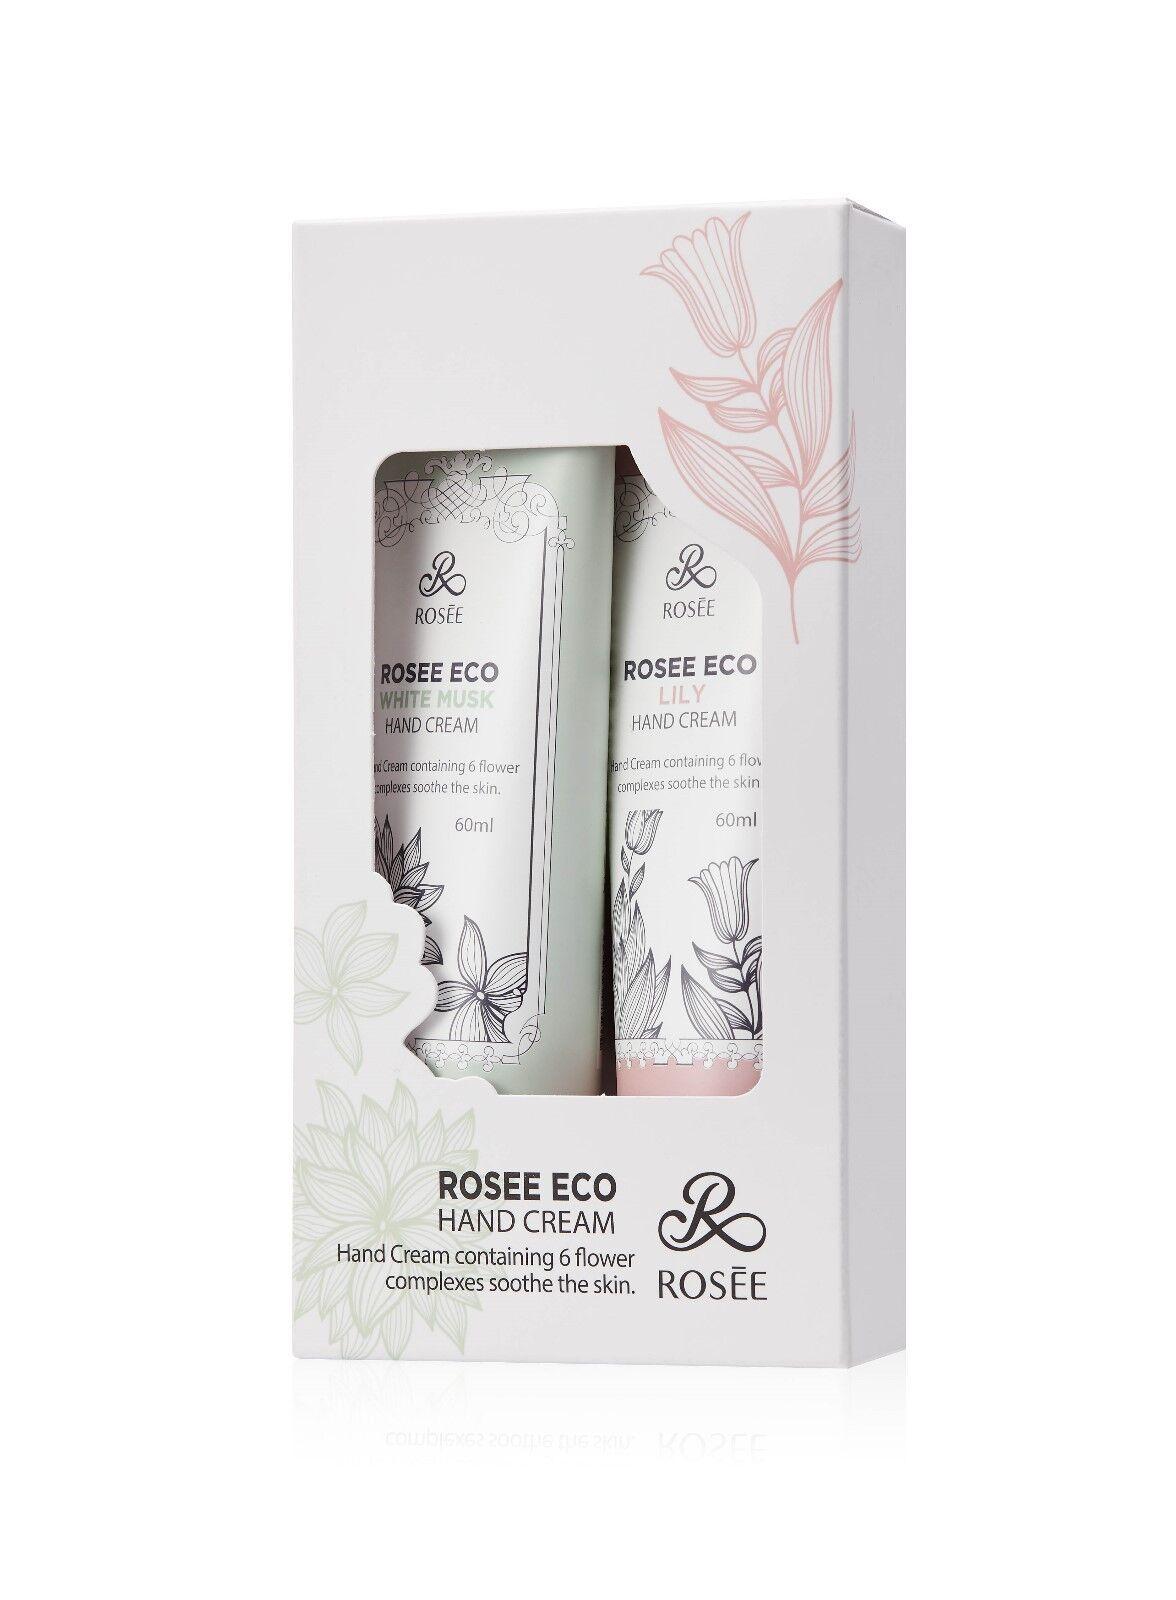 Rosee Eco Hand Cream 2pcs Set / Lily & White Musk-KOREA COSM